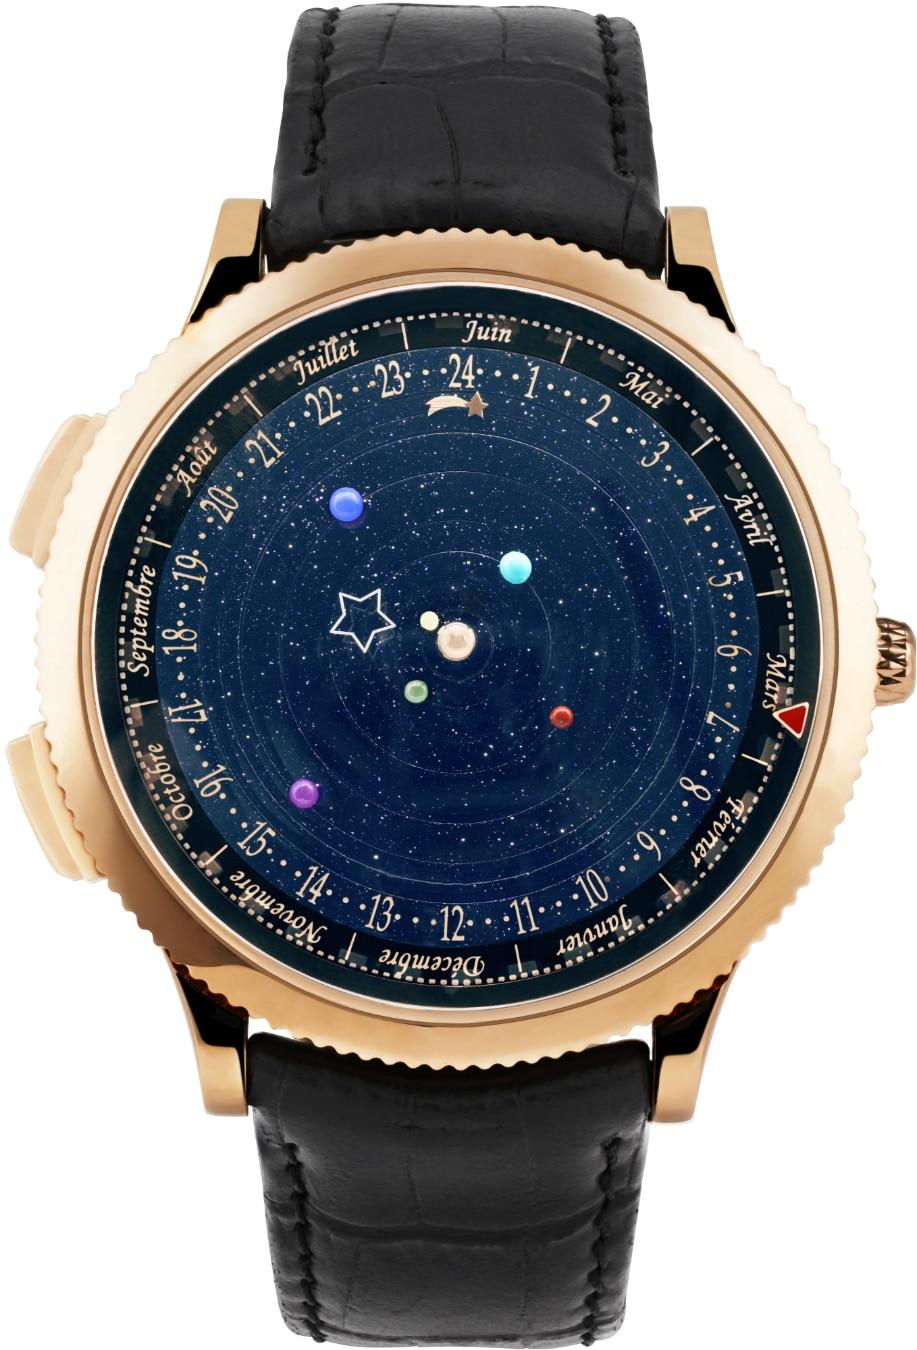 Van Cleef & Arpels Midnight Planétarium Poetic Complication